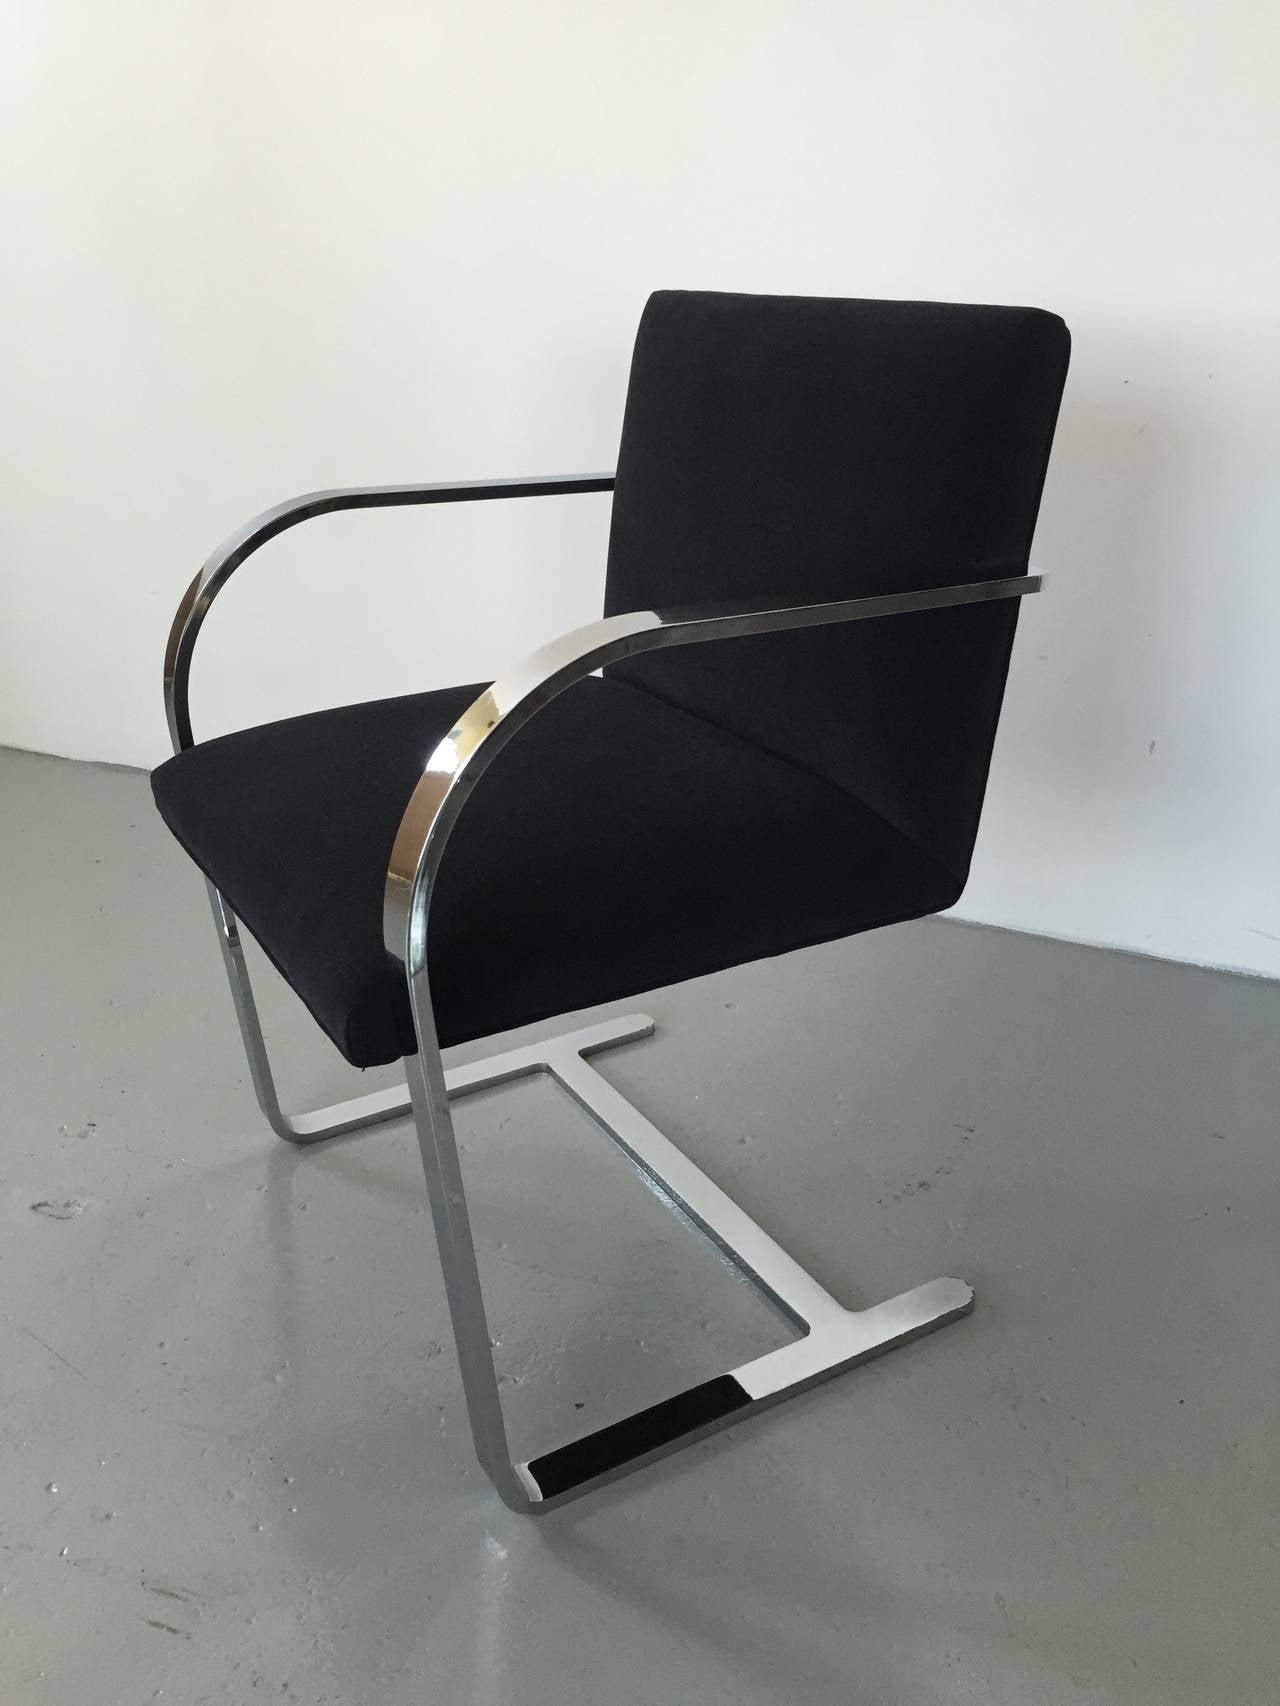 Brno Chair in Black 2